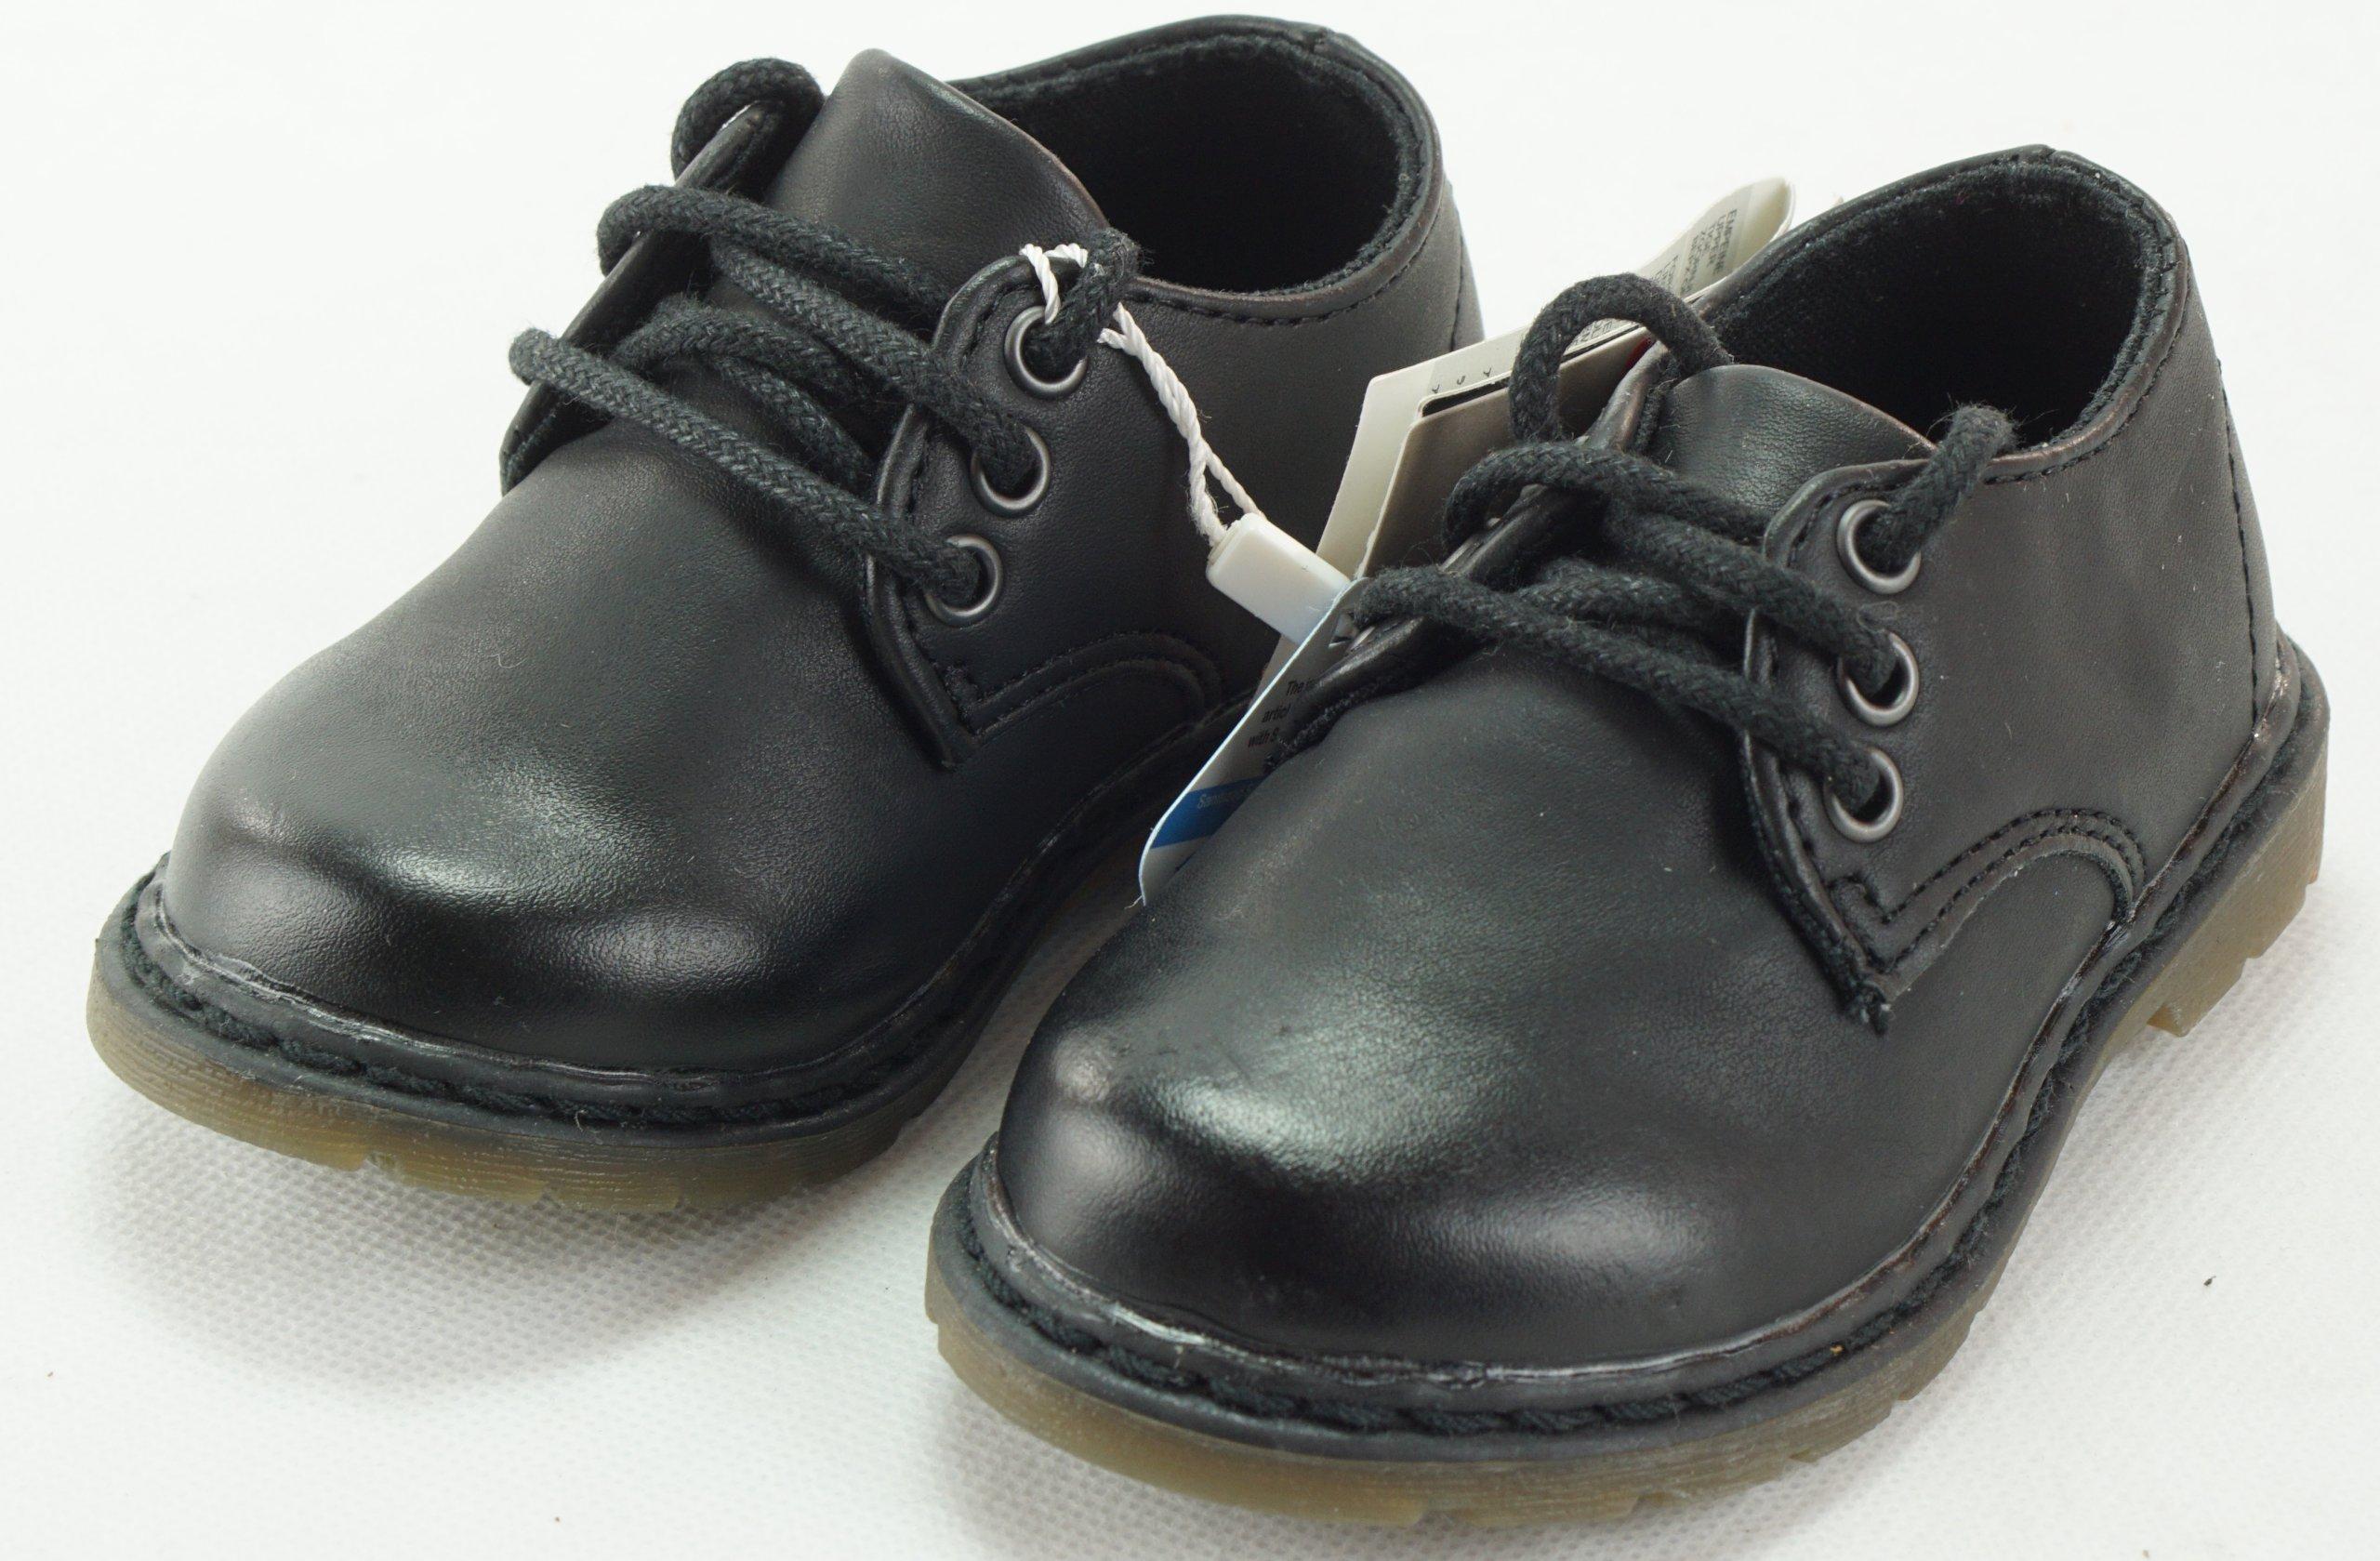 ZARA BABY czarne pantofle R.18 (B27) 4617/03